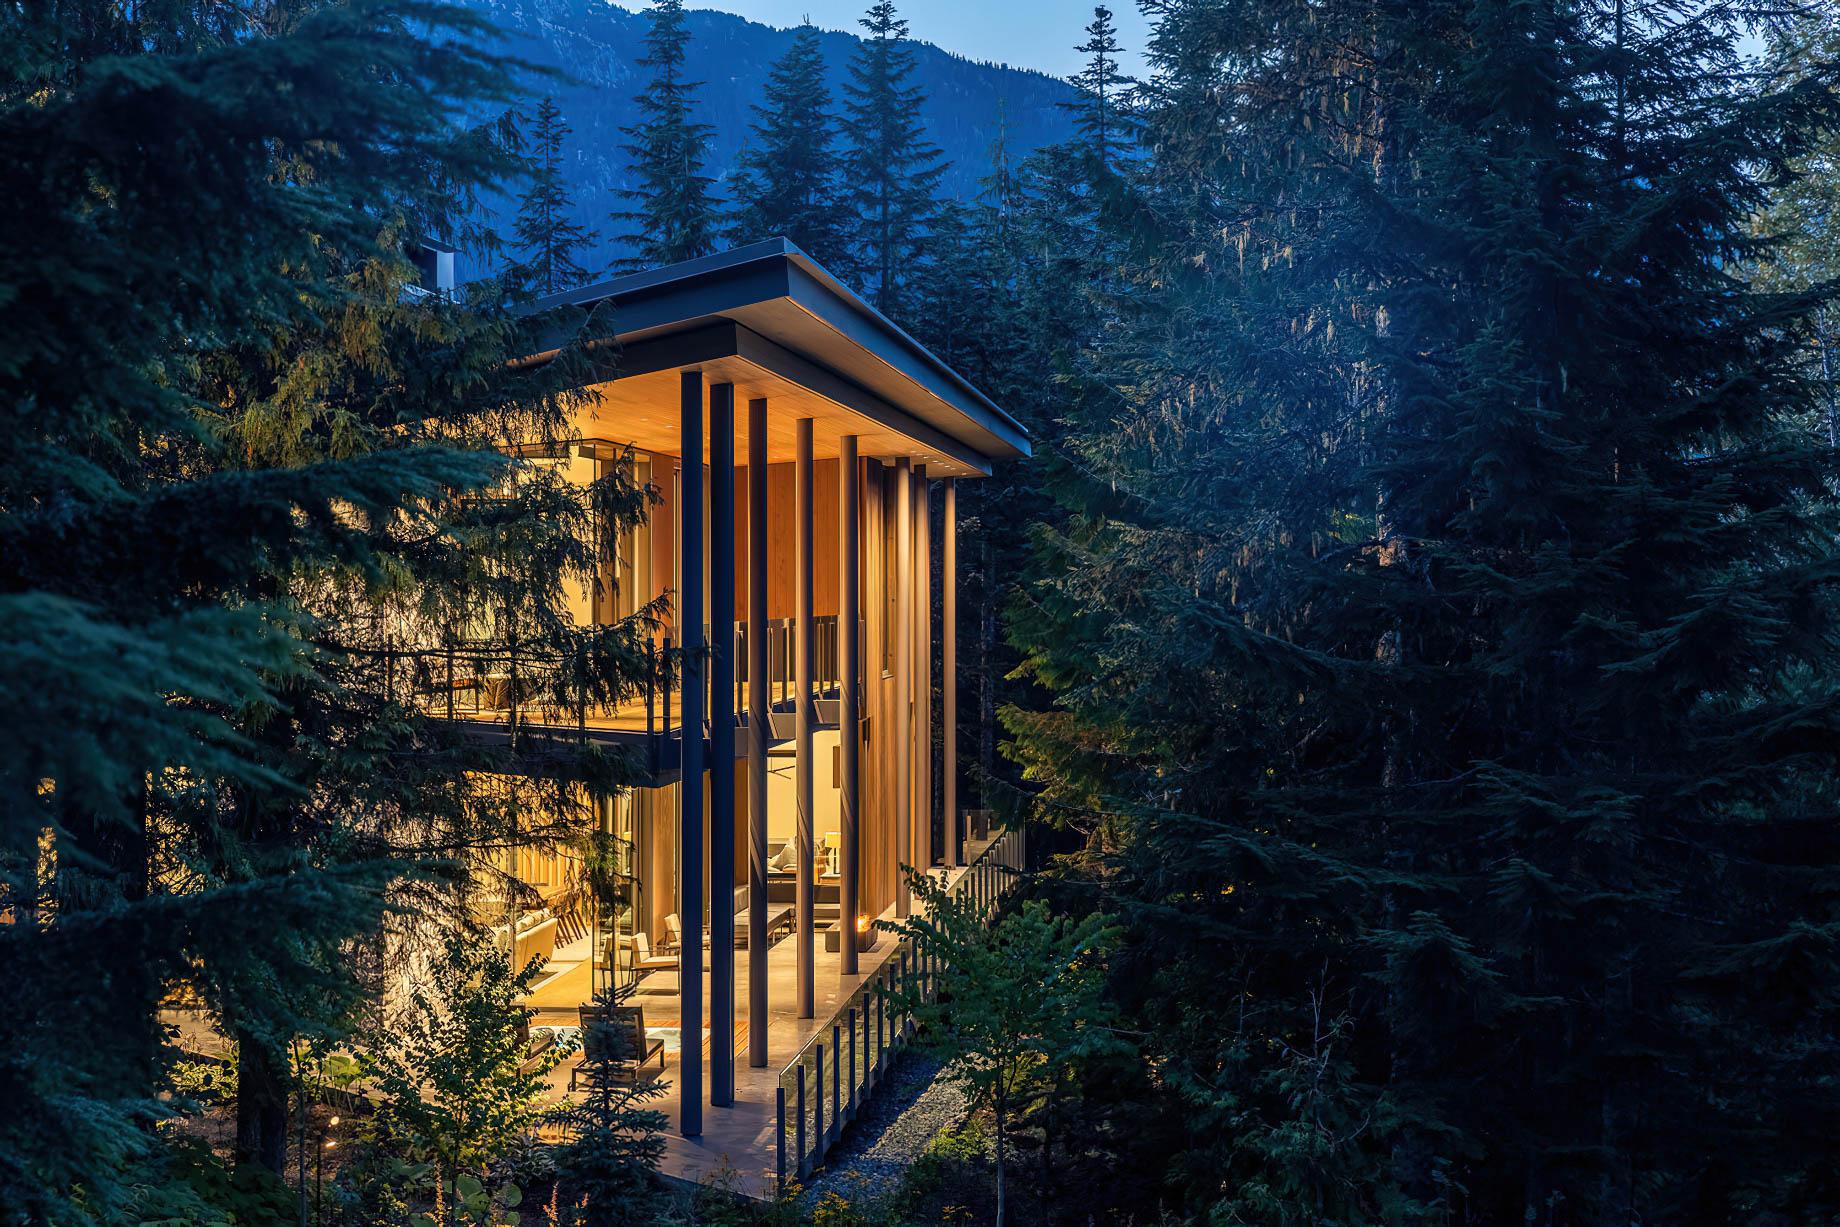 Trails Edge Palatial Luxury Ski Chalet Residence - Whistler, BC, Canada